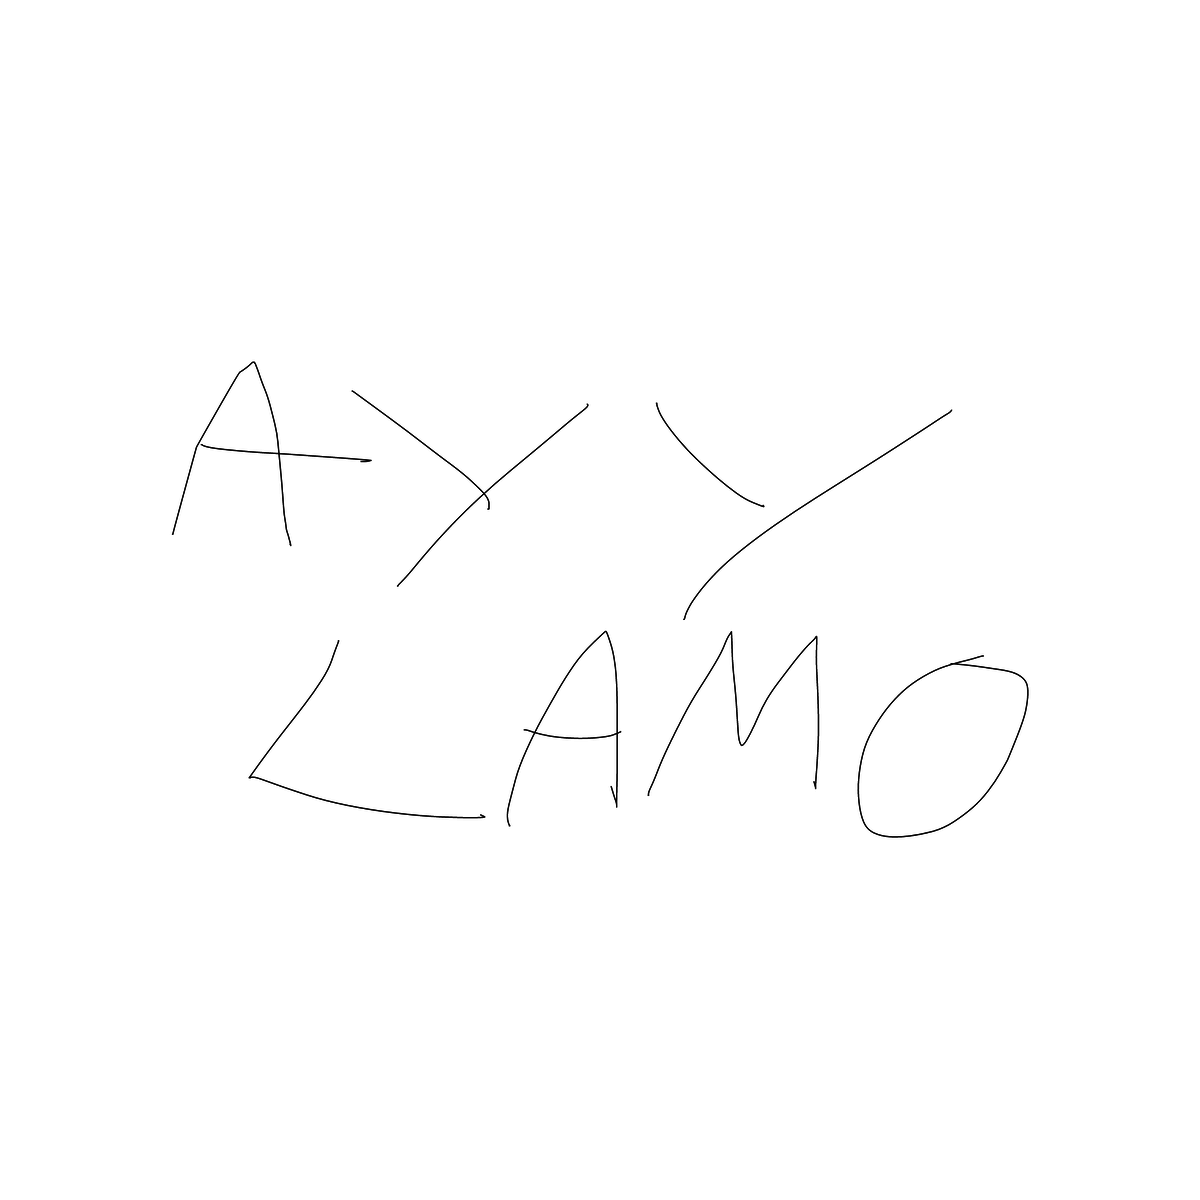 BAAAM drawing#17686 lat:55.1748123168945300lng: -1.6929059028625488